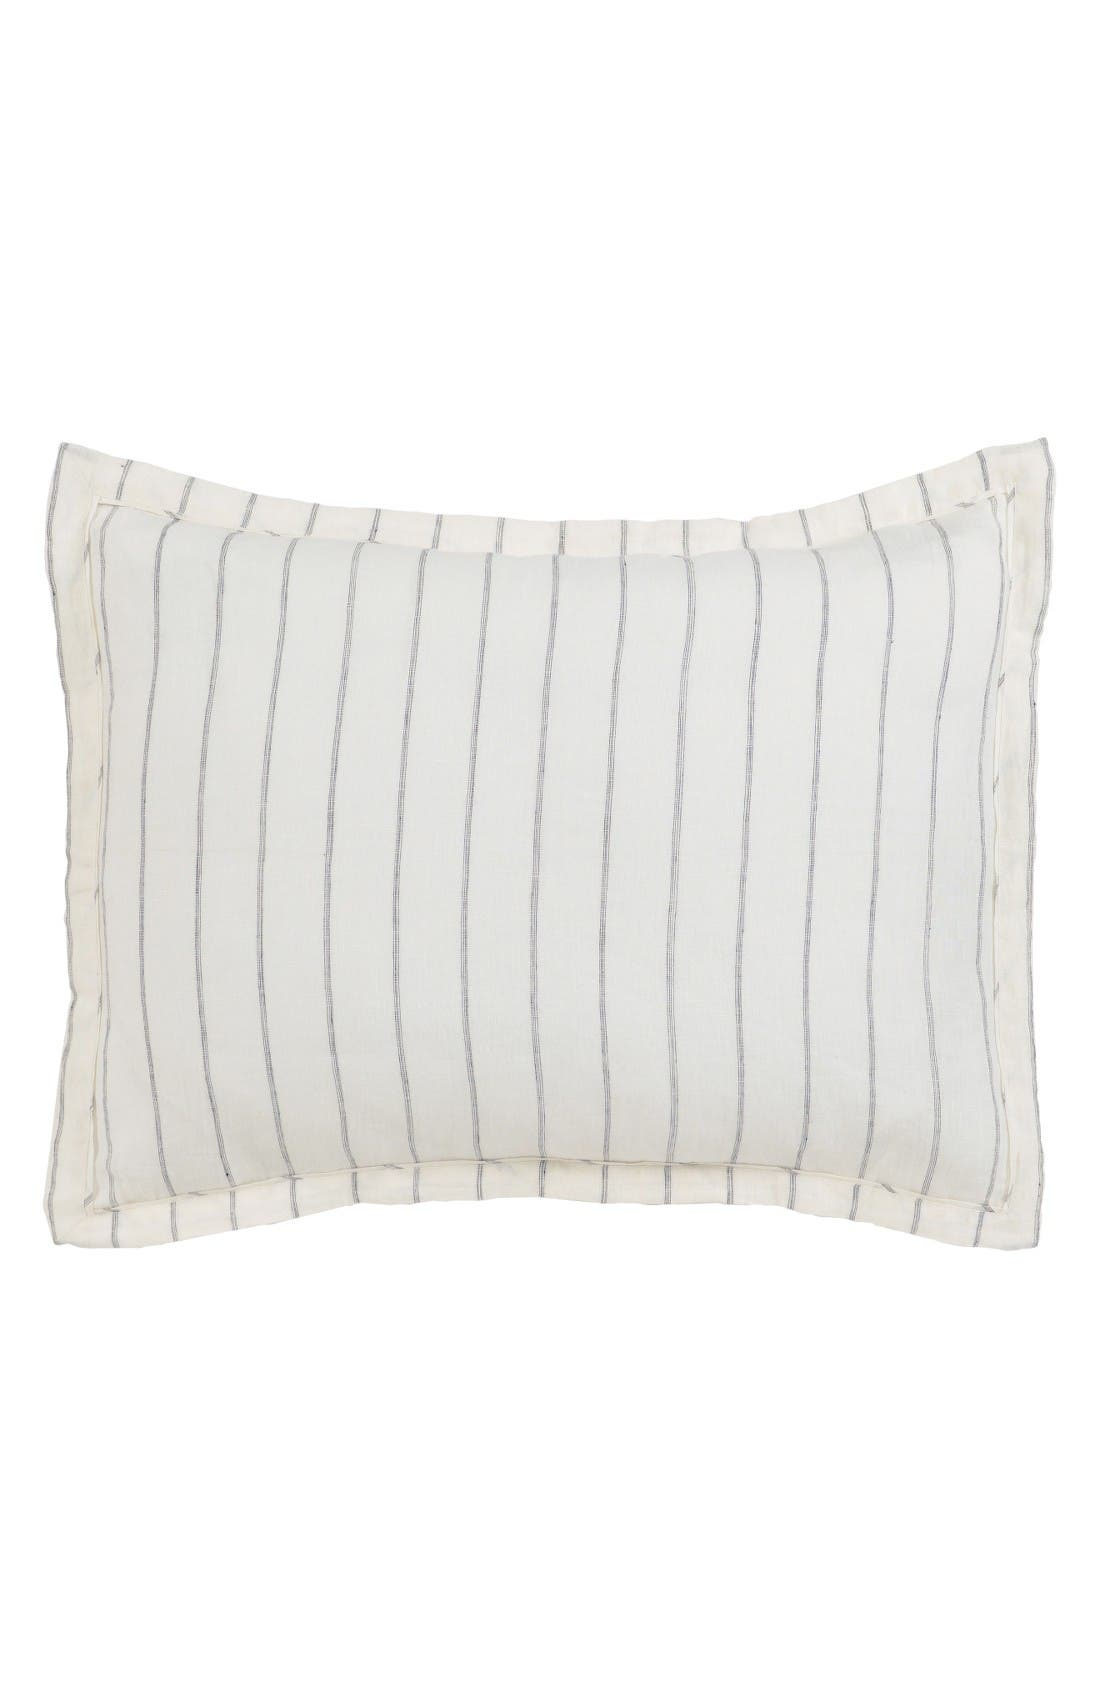 Villa Home Collection Pinstripe Linen Standard Sham